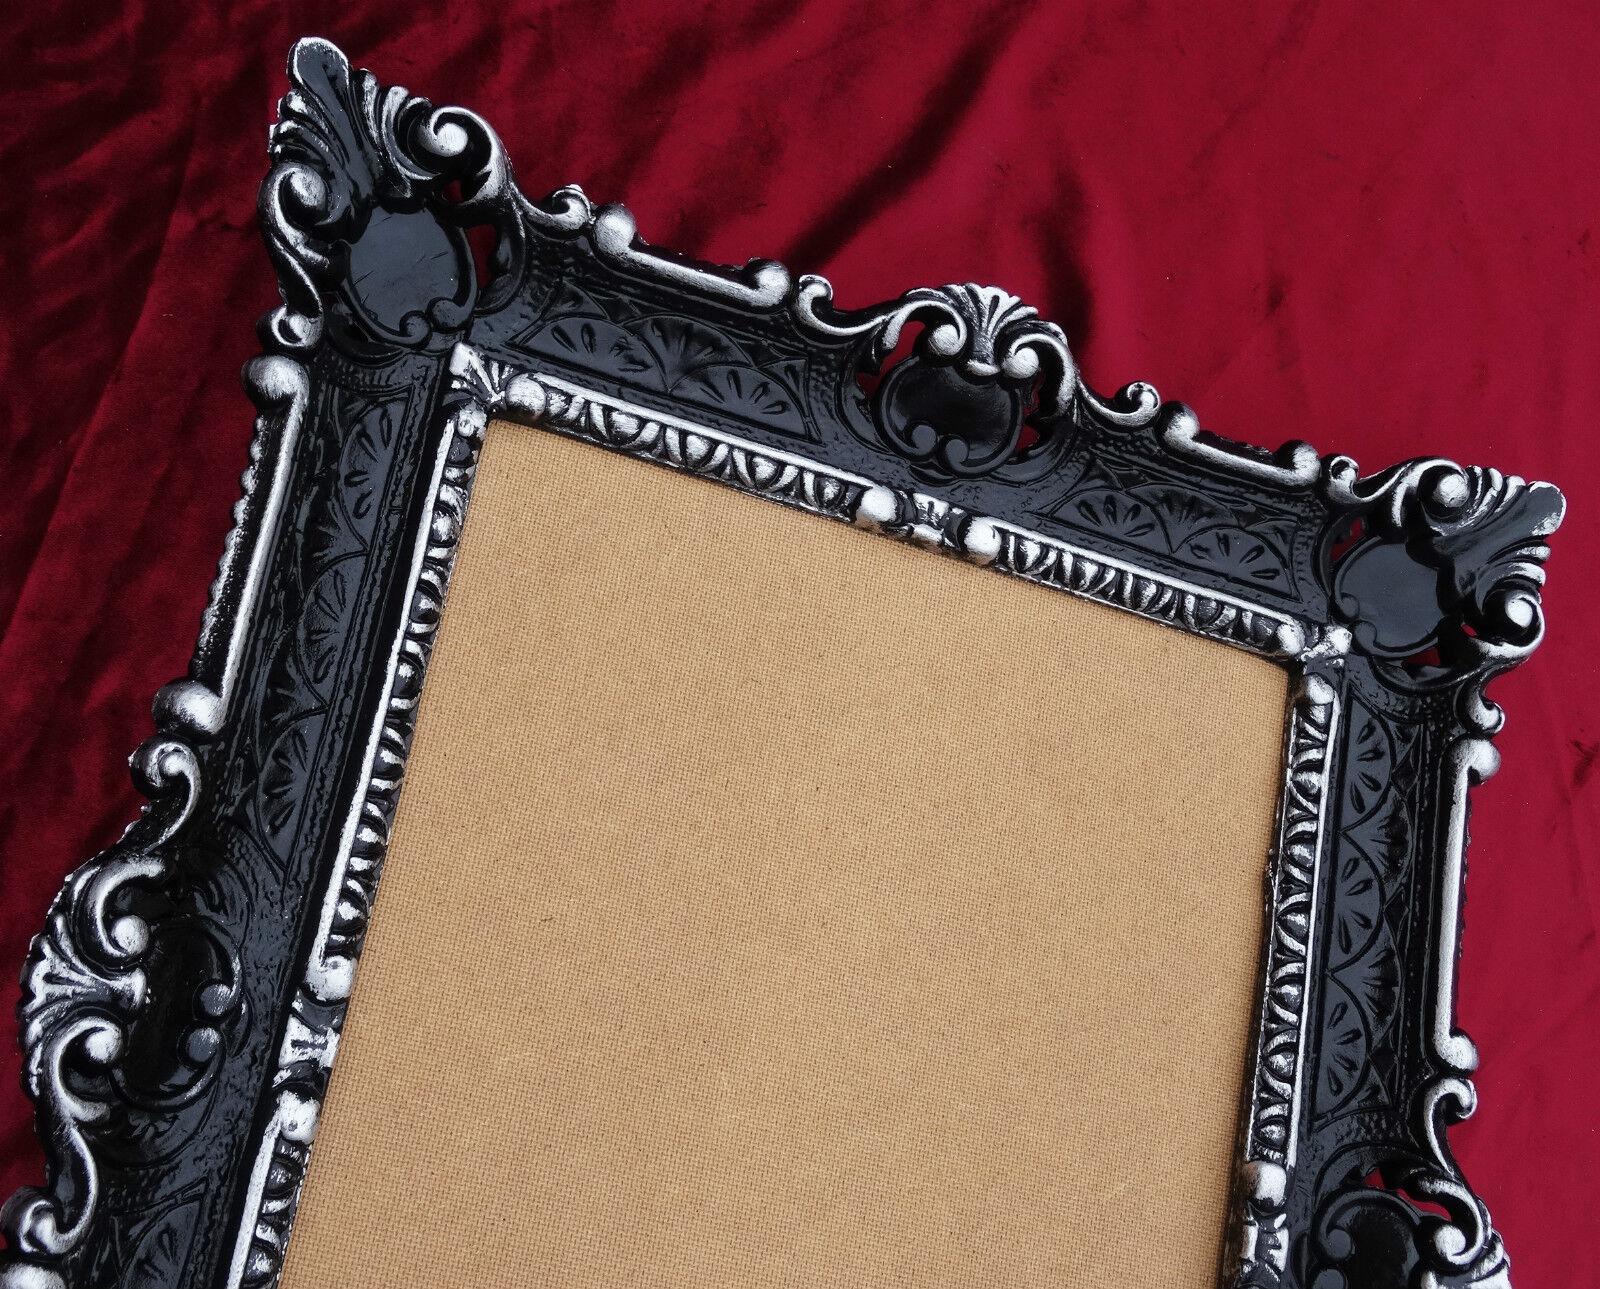 antik barock bilderrahmen schwarz silber 56x46 fotorahmen replikate repro rahmen ebay. Black Bedroom Furniture Sets. Home Design Ideas